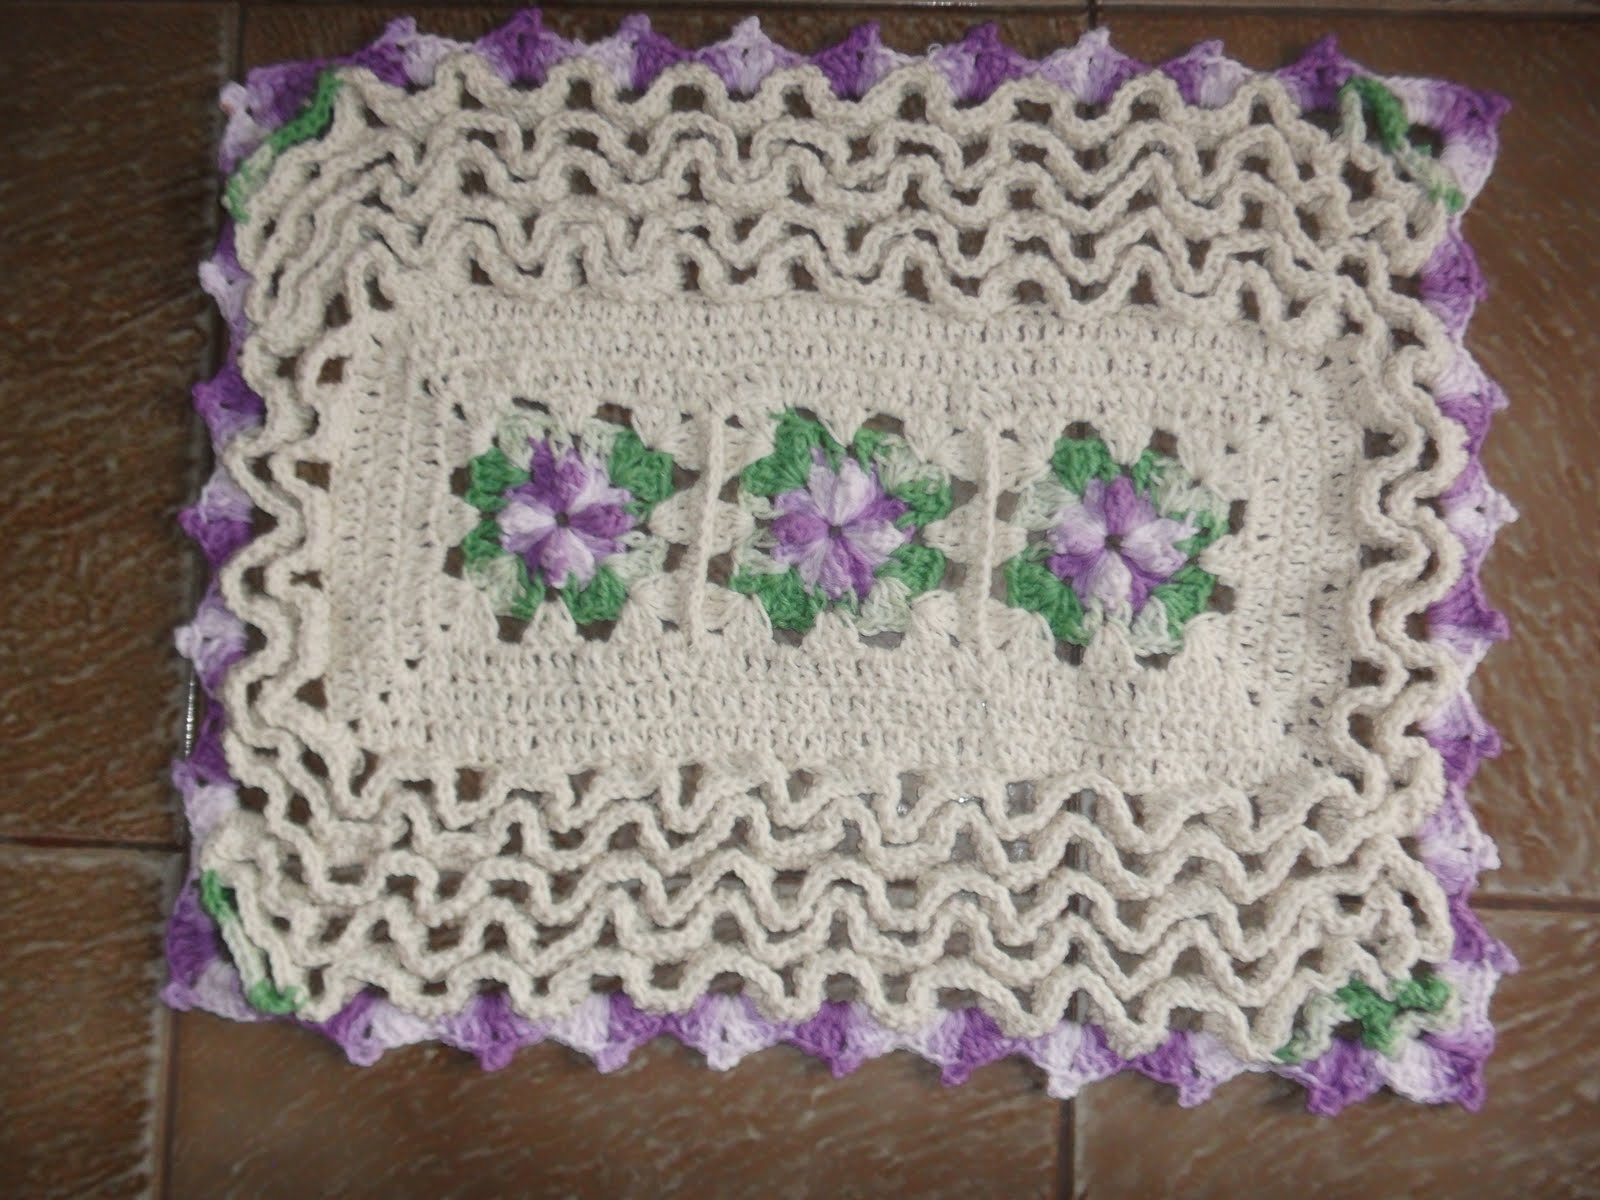 bete barbante croche tapete floral. Black Bedroom Furniture Sets. Home Design Ideas